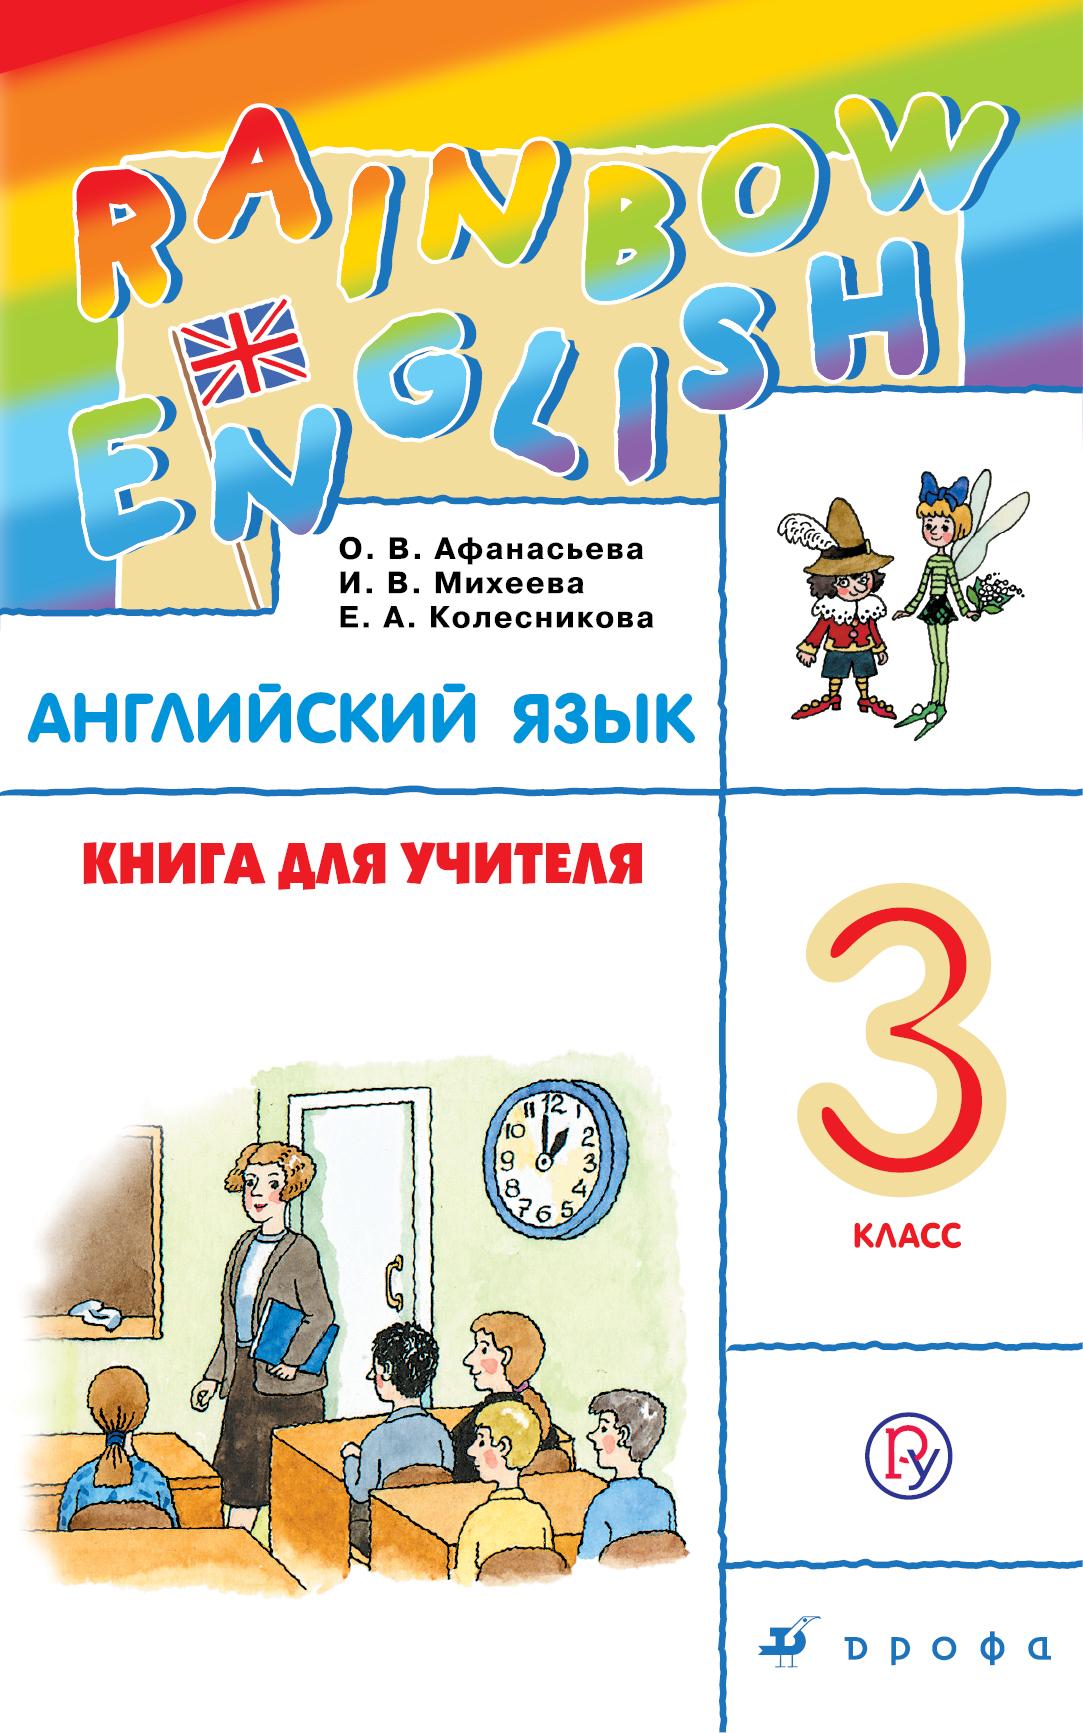 Английский язык. 3 класс. Книга для учителя ( Афанасьева О.В., Михеева И.В., Колесникова Е.А.  )